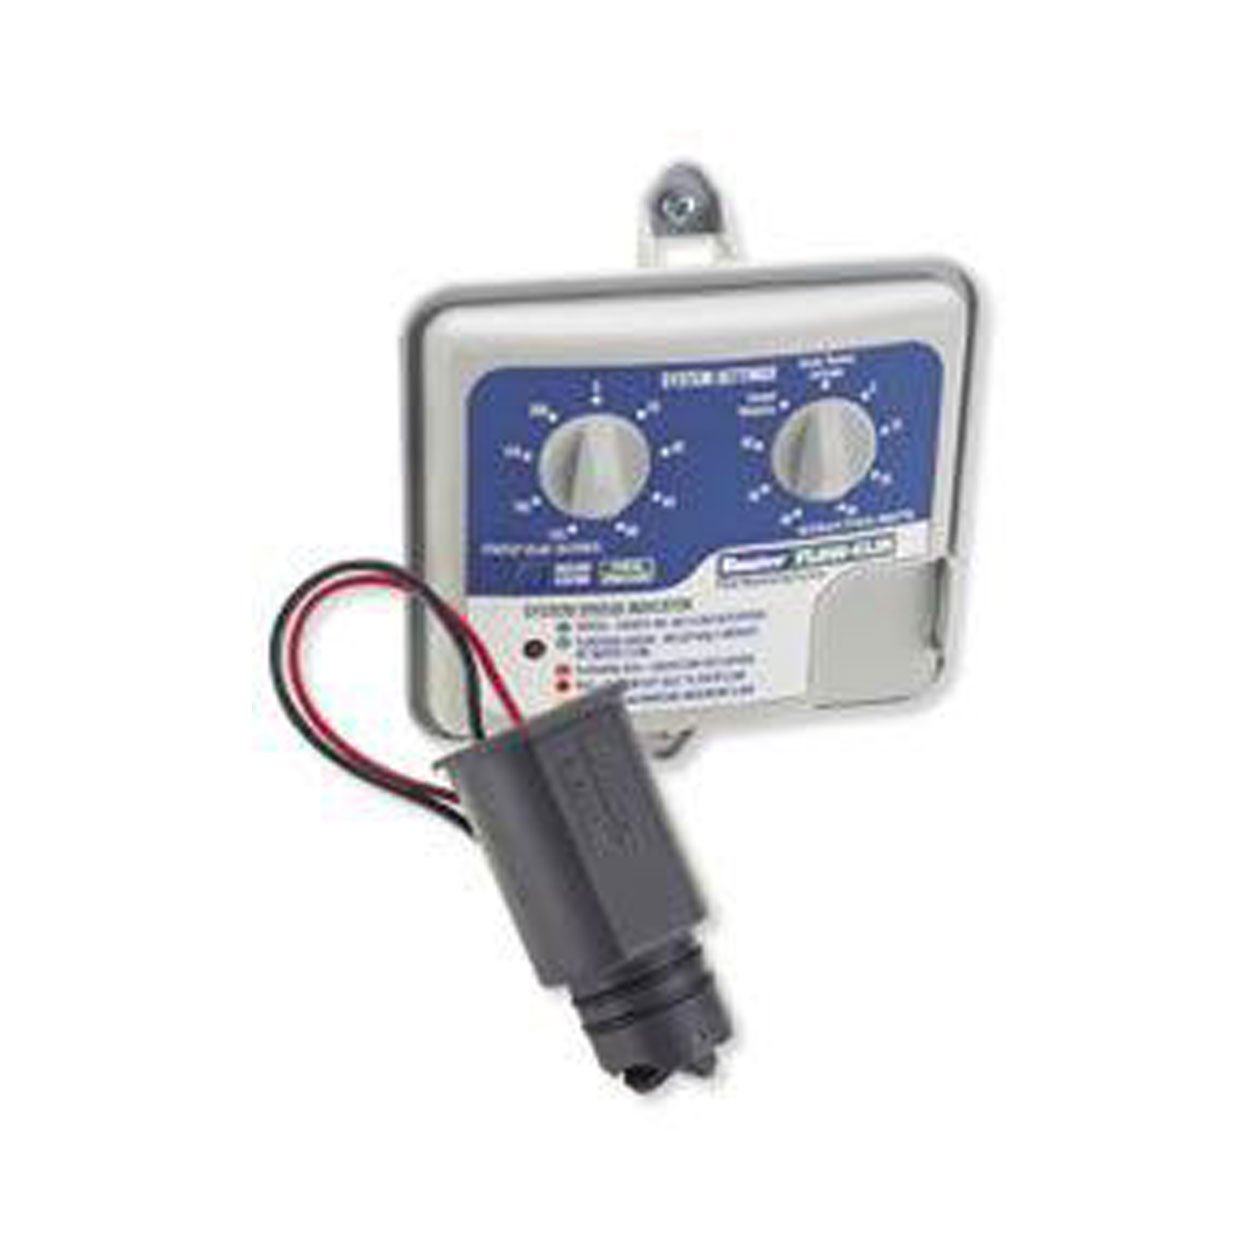 Hunter Sprinkler FLOWCLIK Standard Kit for all 24 VAC Controllers Standard Plumbing Supply-LG